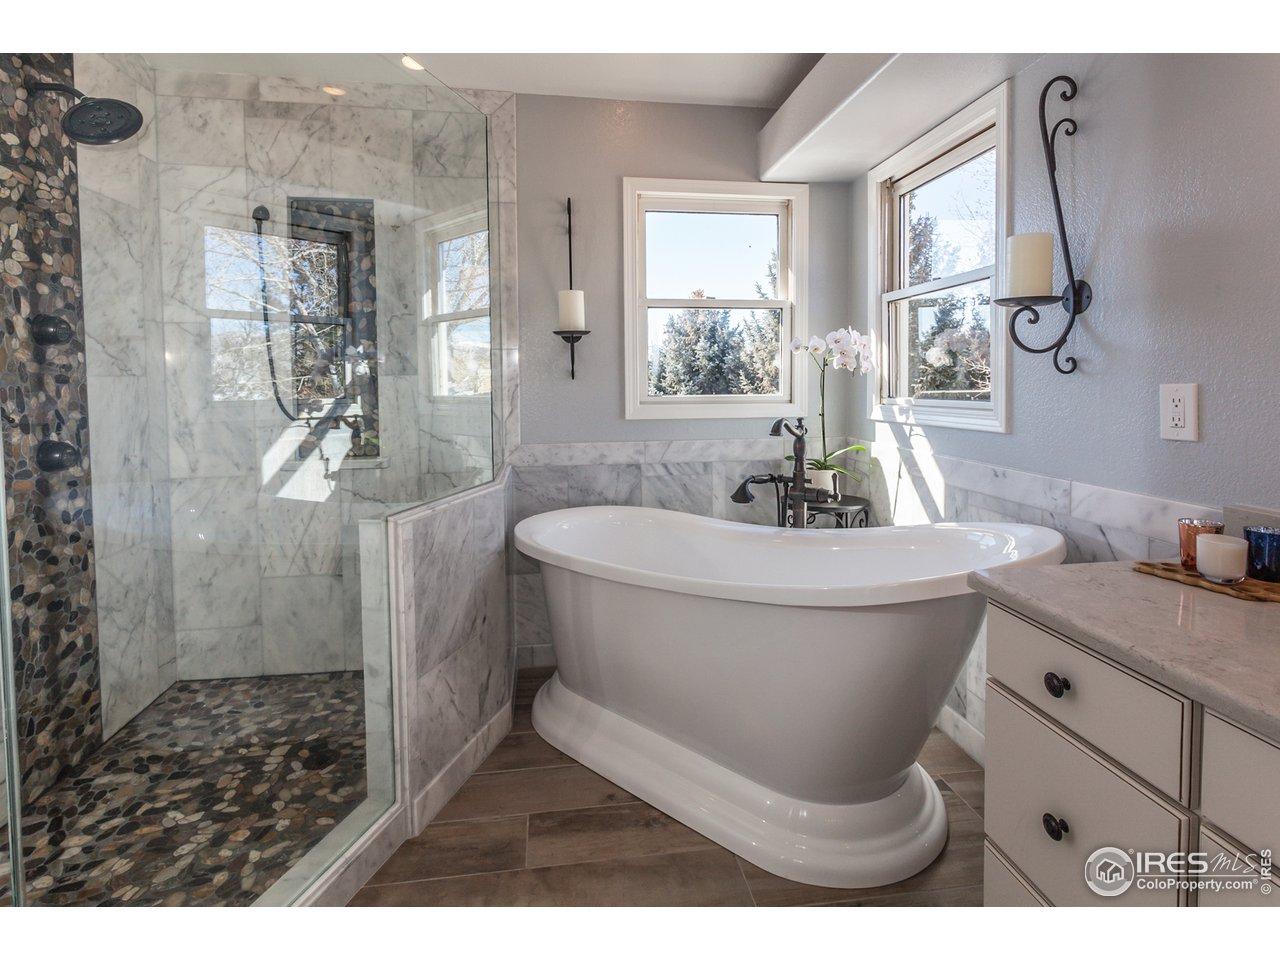 Gorgeous open shower